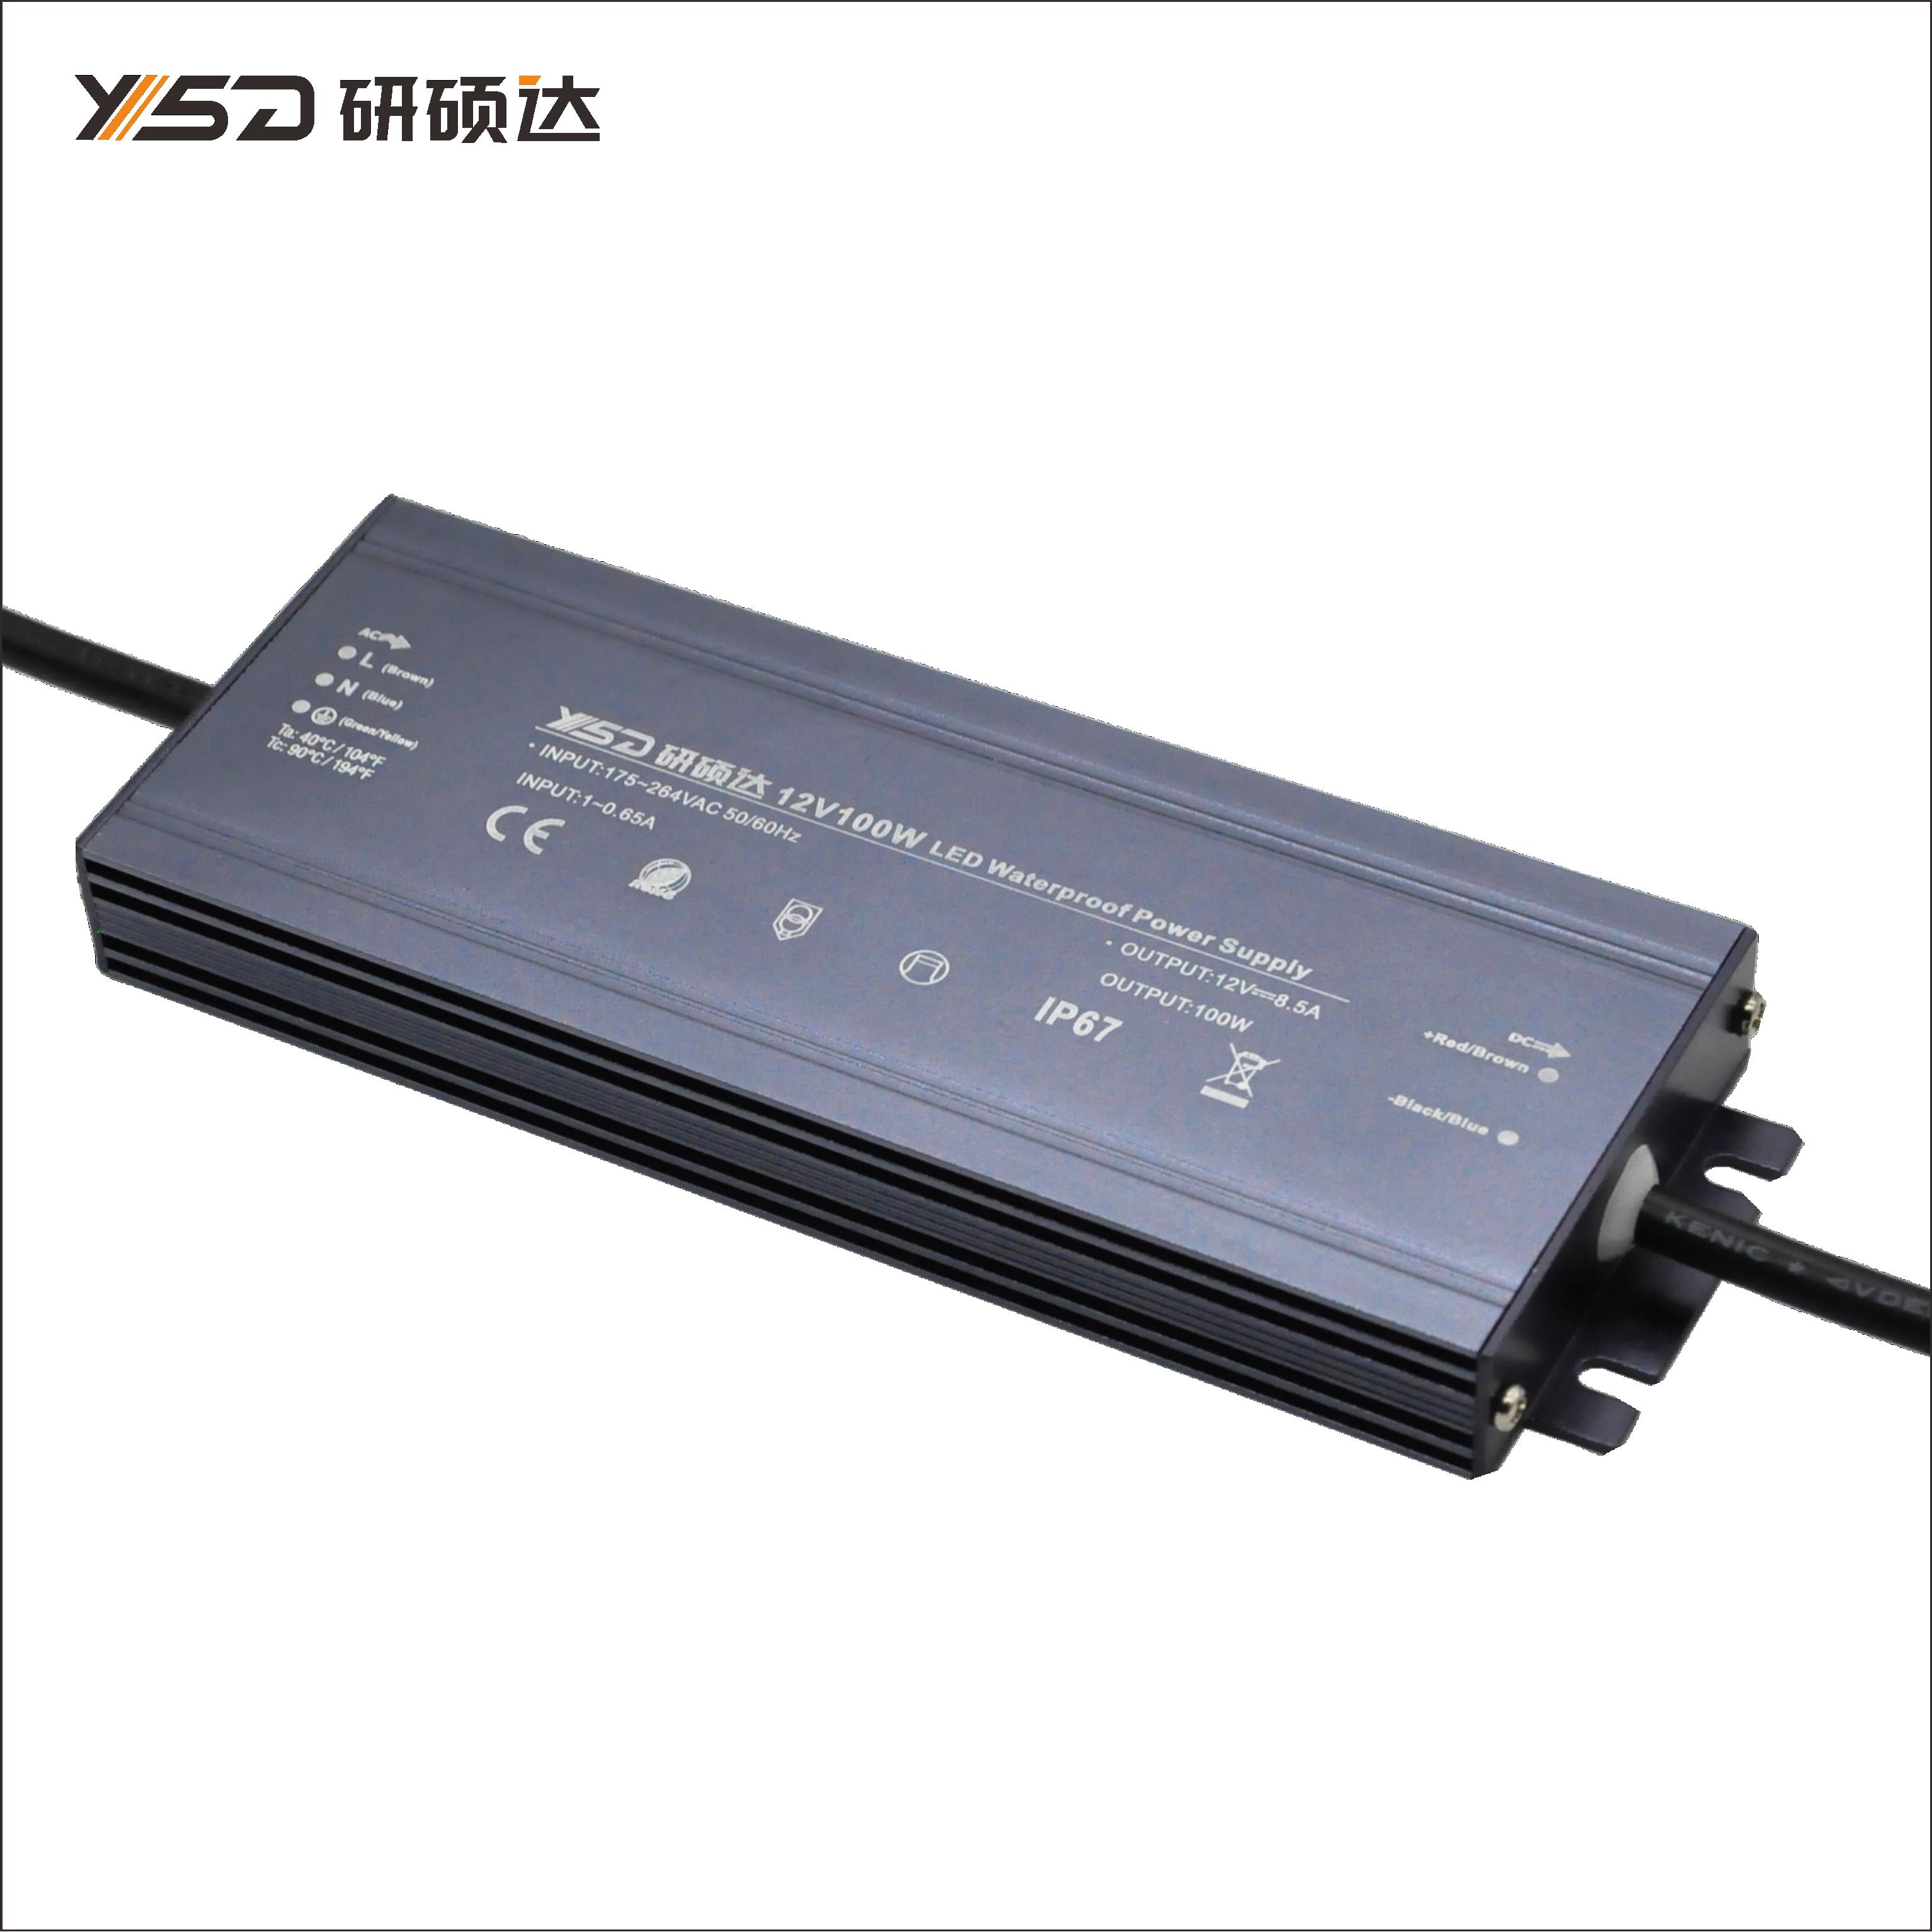 A/B LED power supply